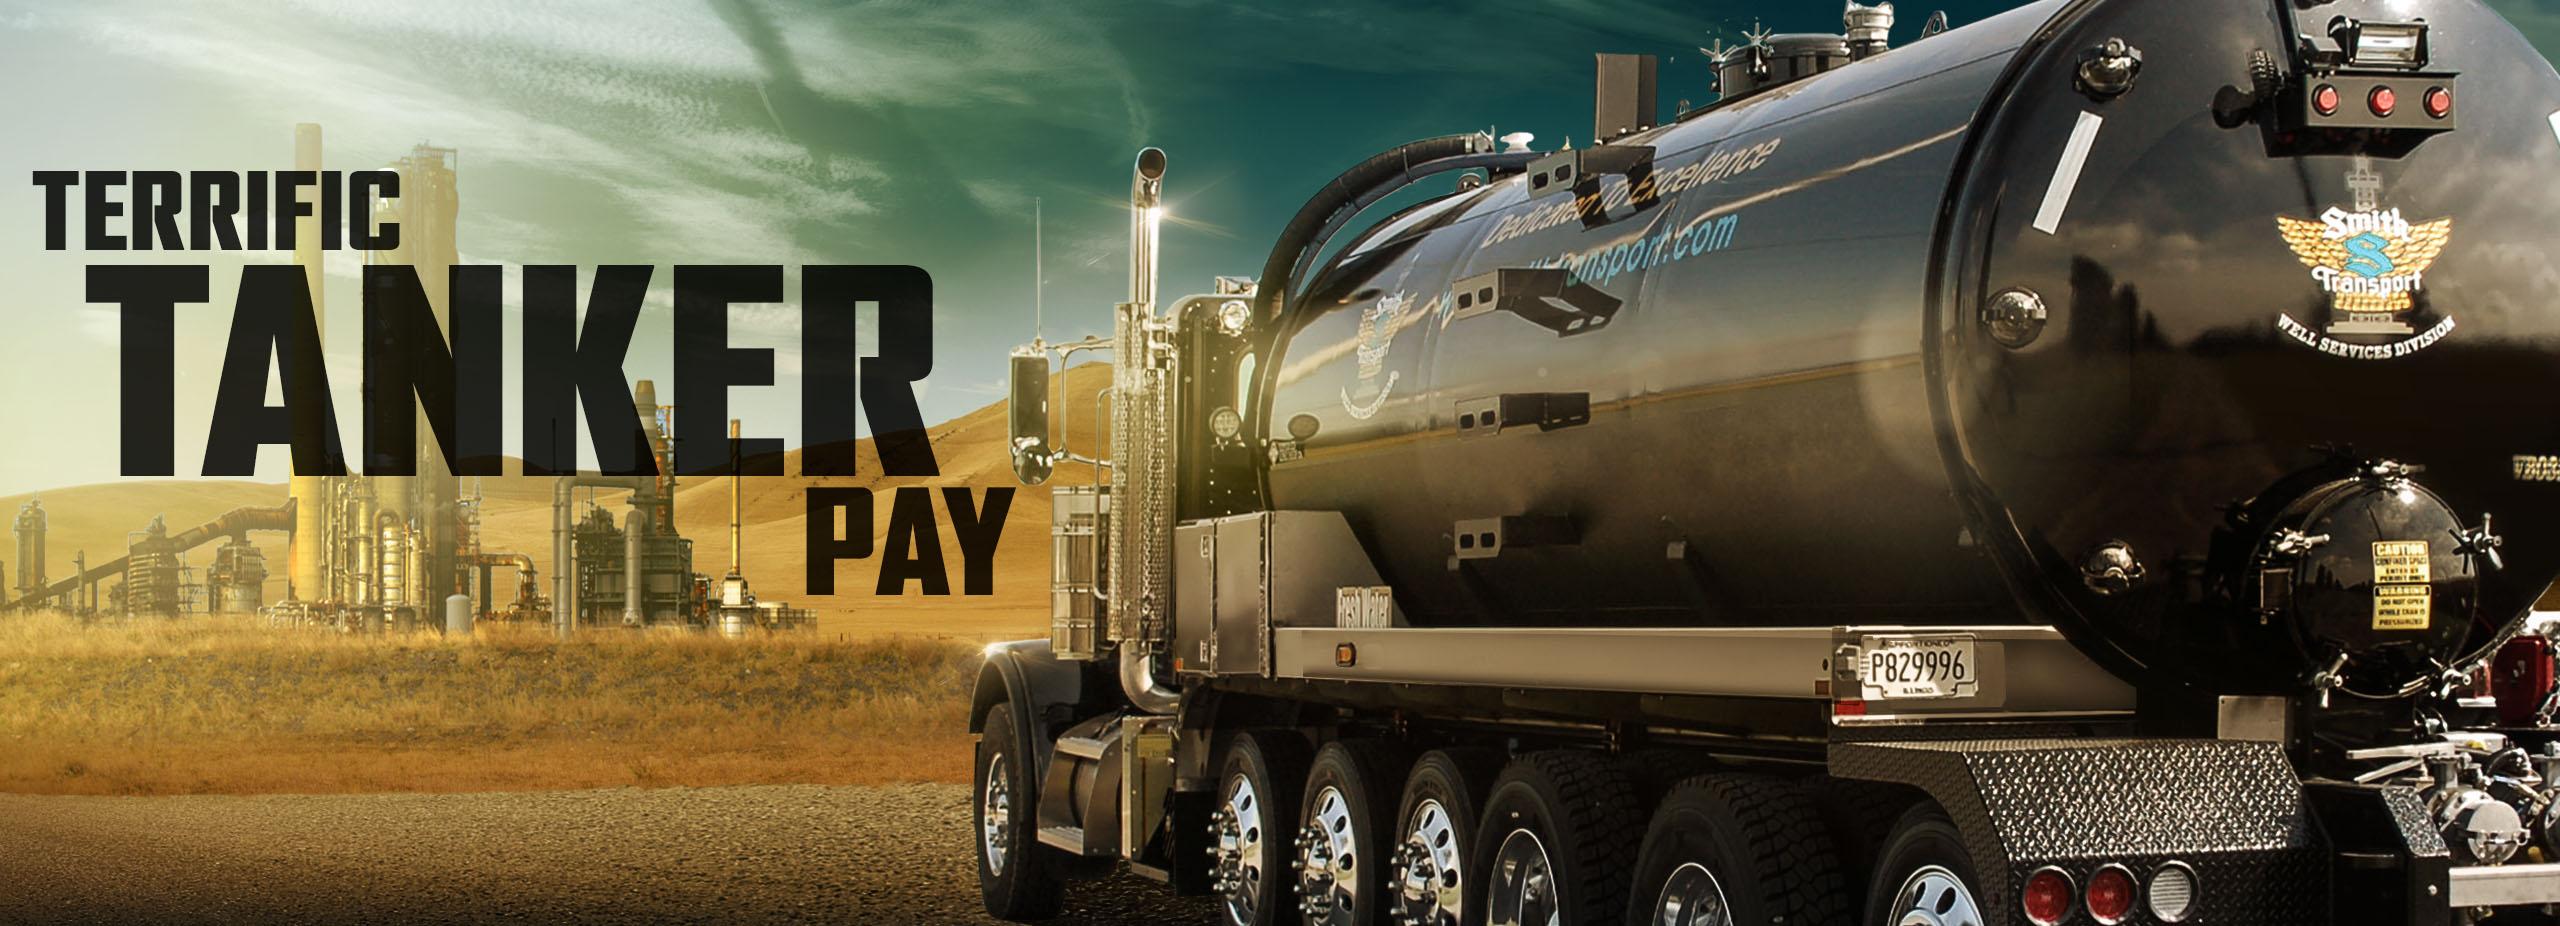 Terrific Tanker Pay